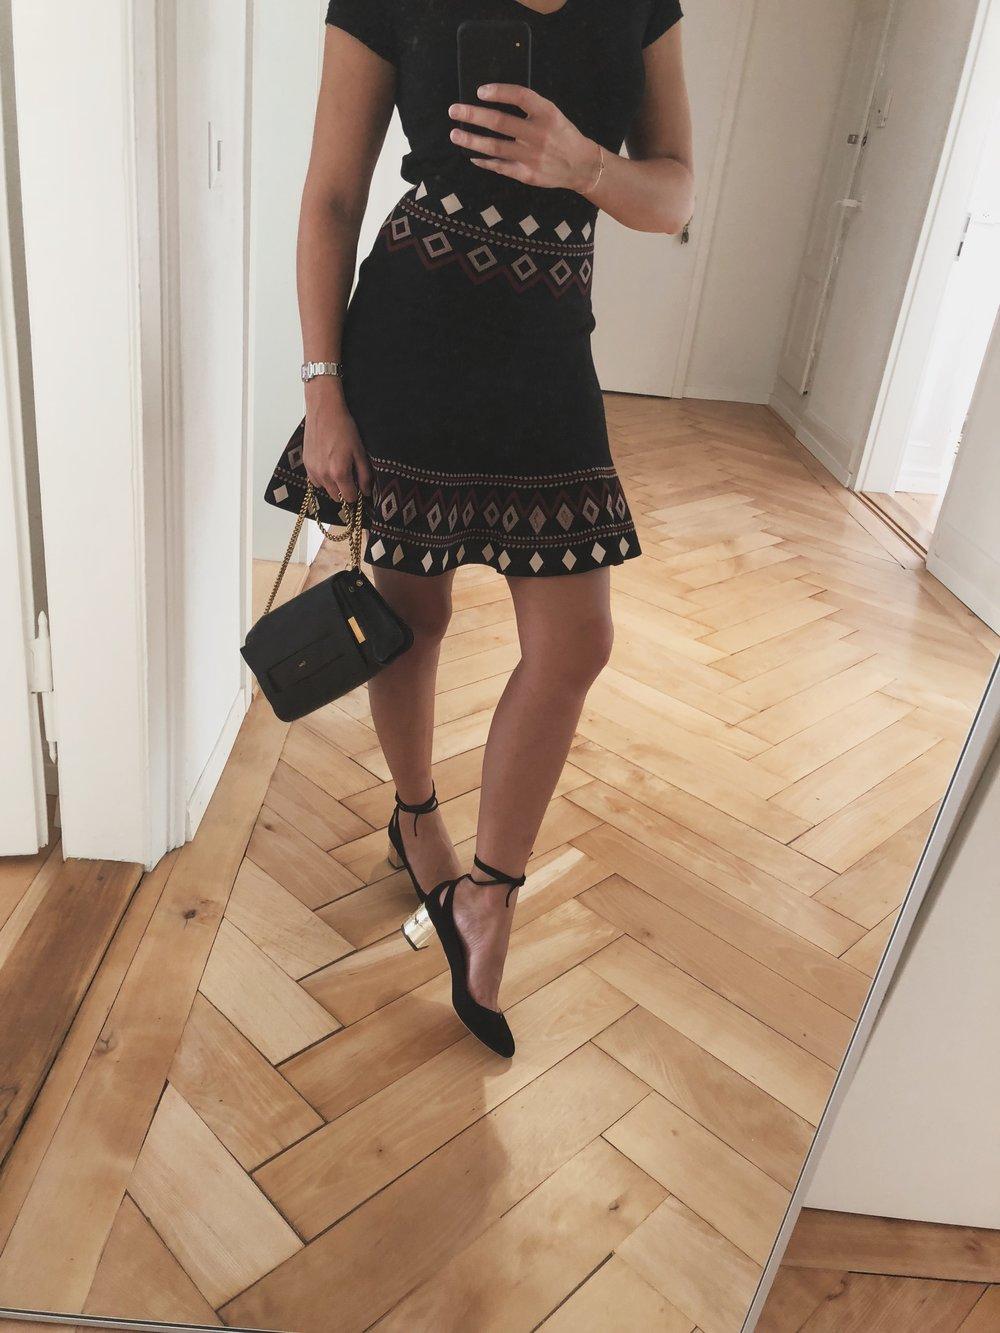 Bag - Chloe, Skirt - Alexander McQueen, Shoes - Aquazzura, T-shirt - Anine Bing